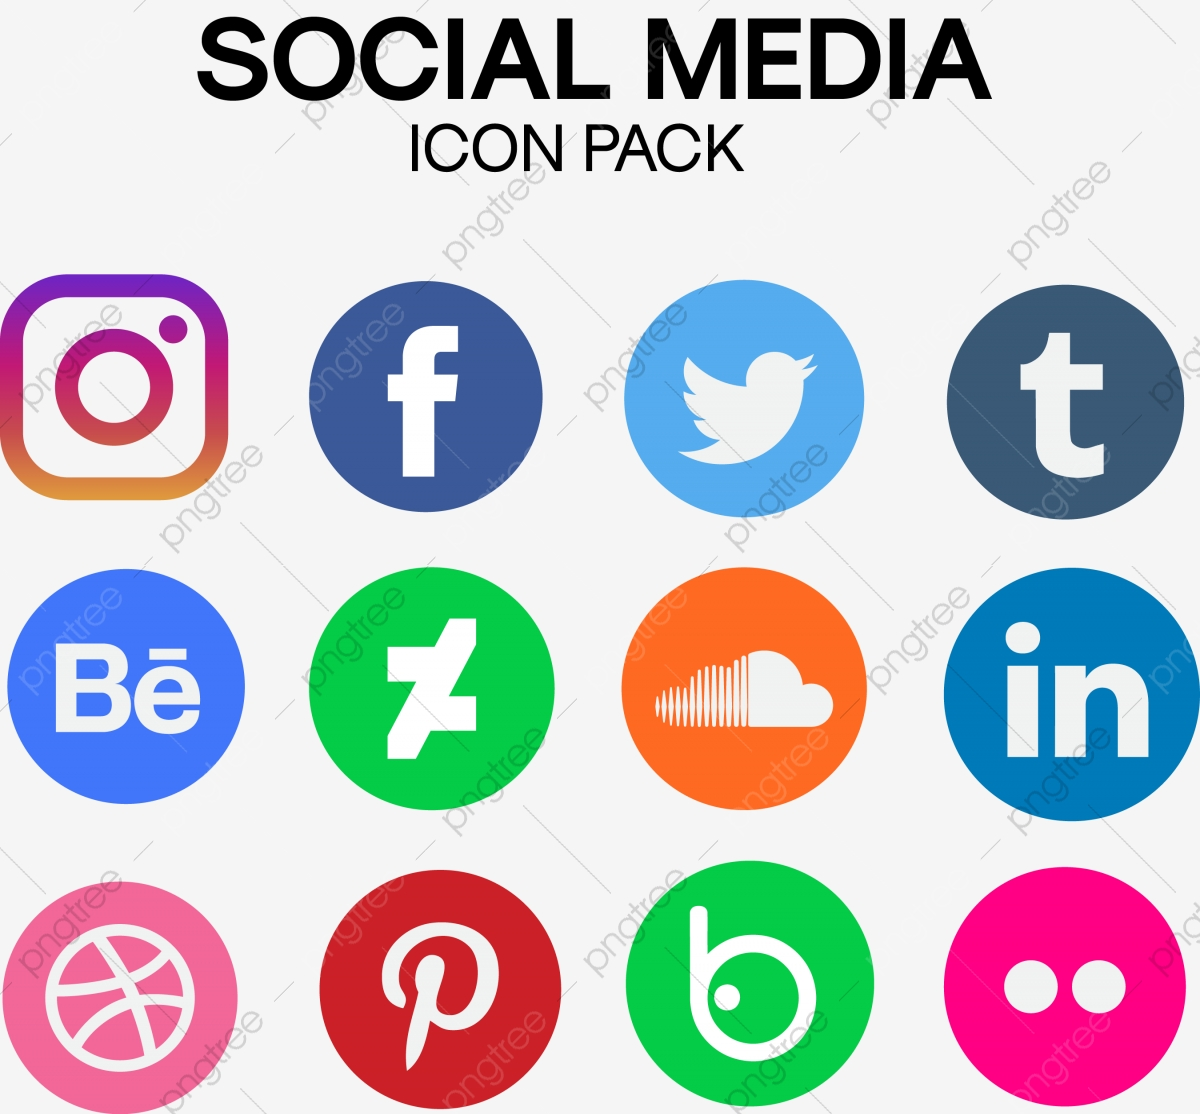 Popular Social Media Icon Pack, App, Socialmedia, Icon PNG and.